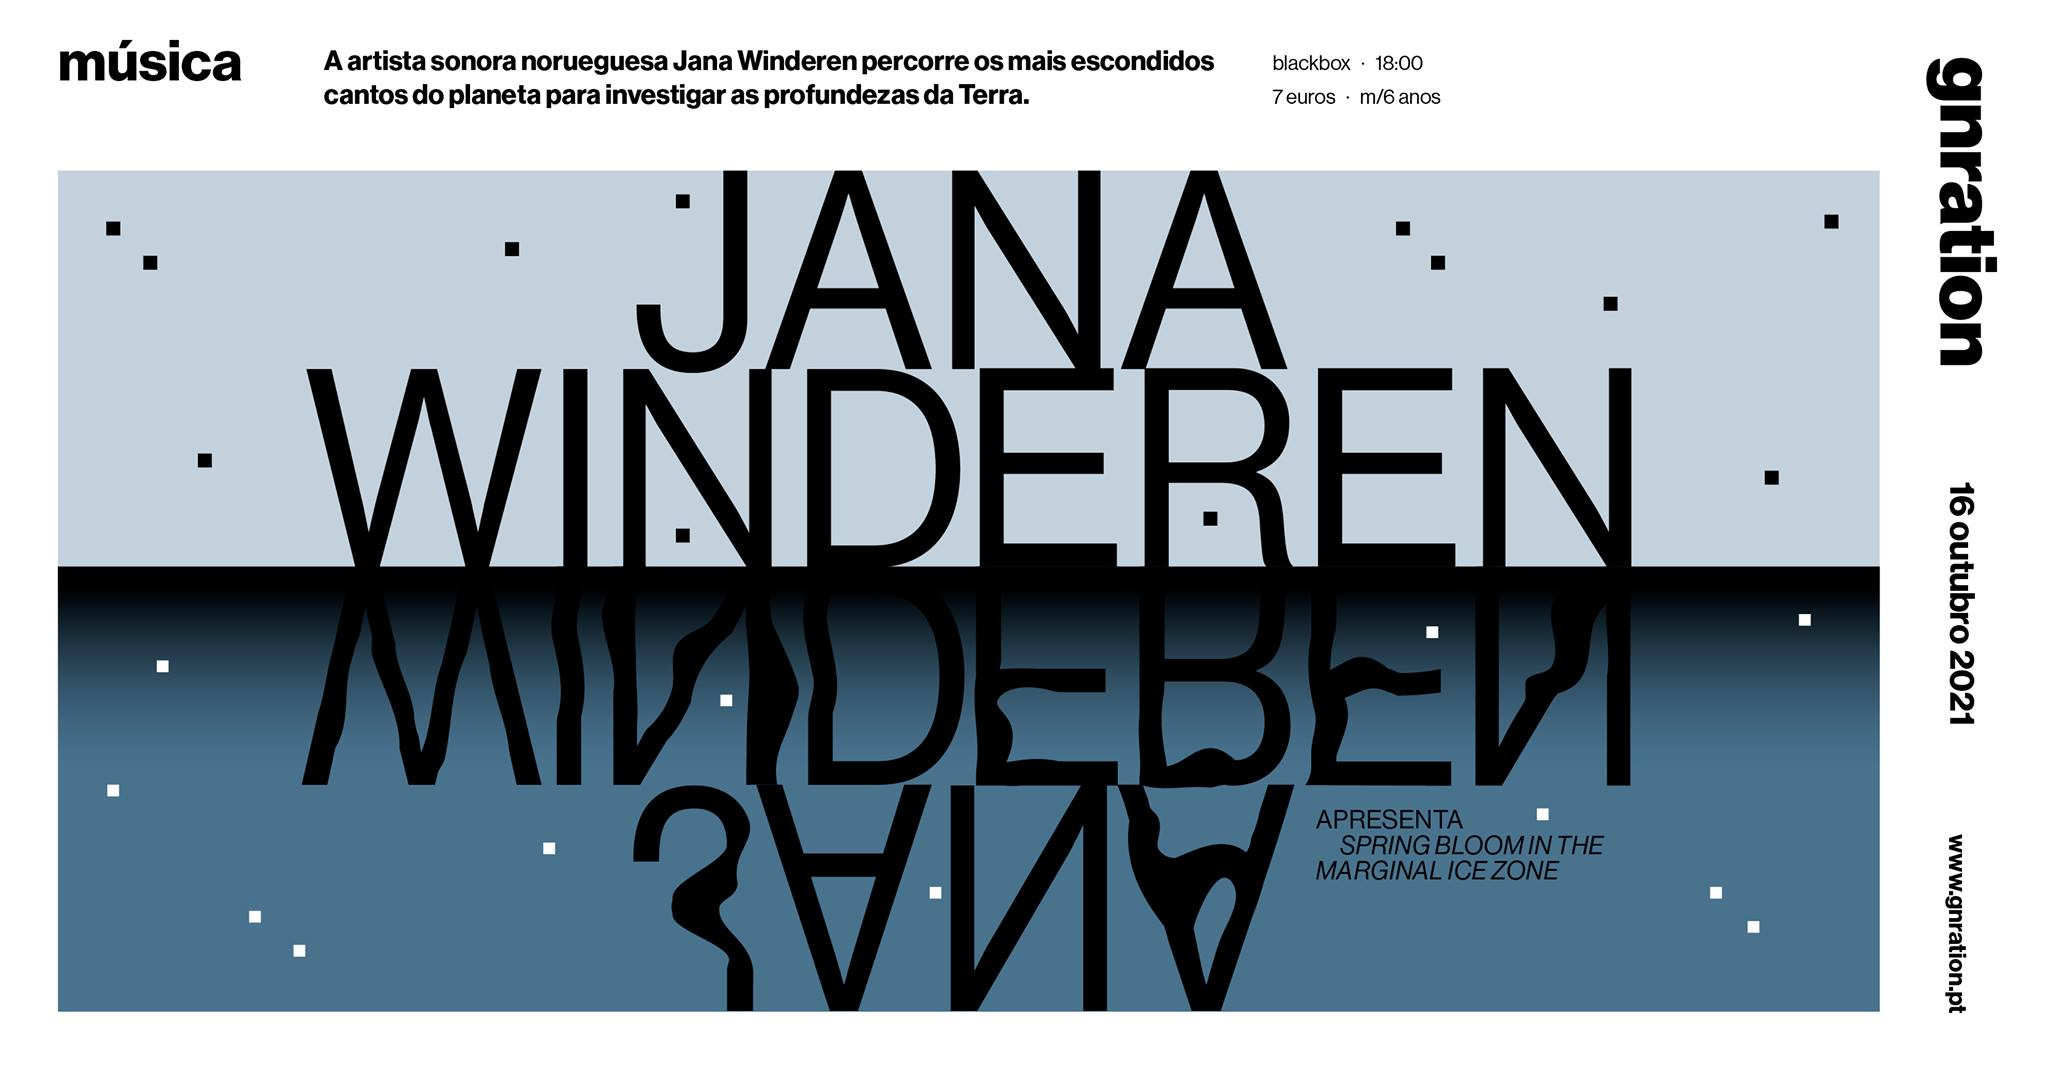 Jana Winderen apresenta Spring Bloom in the Marginal Ice Zone | gnration